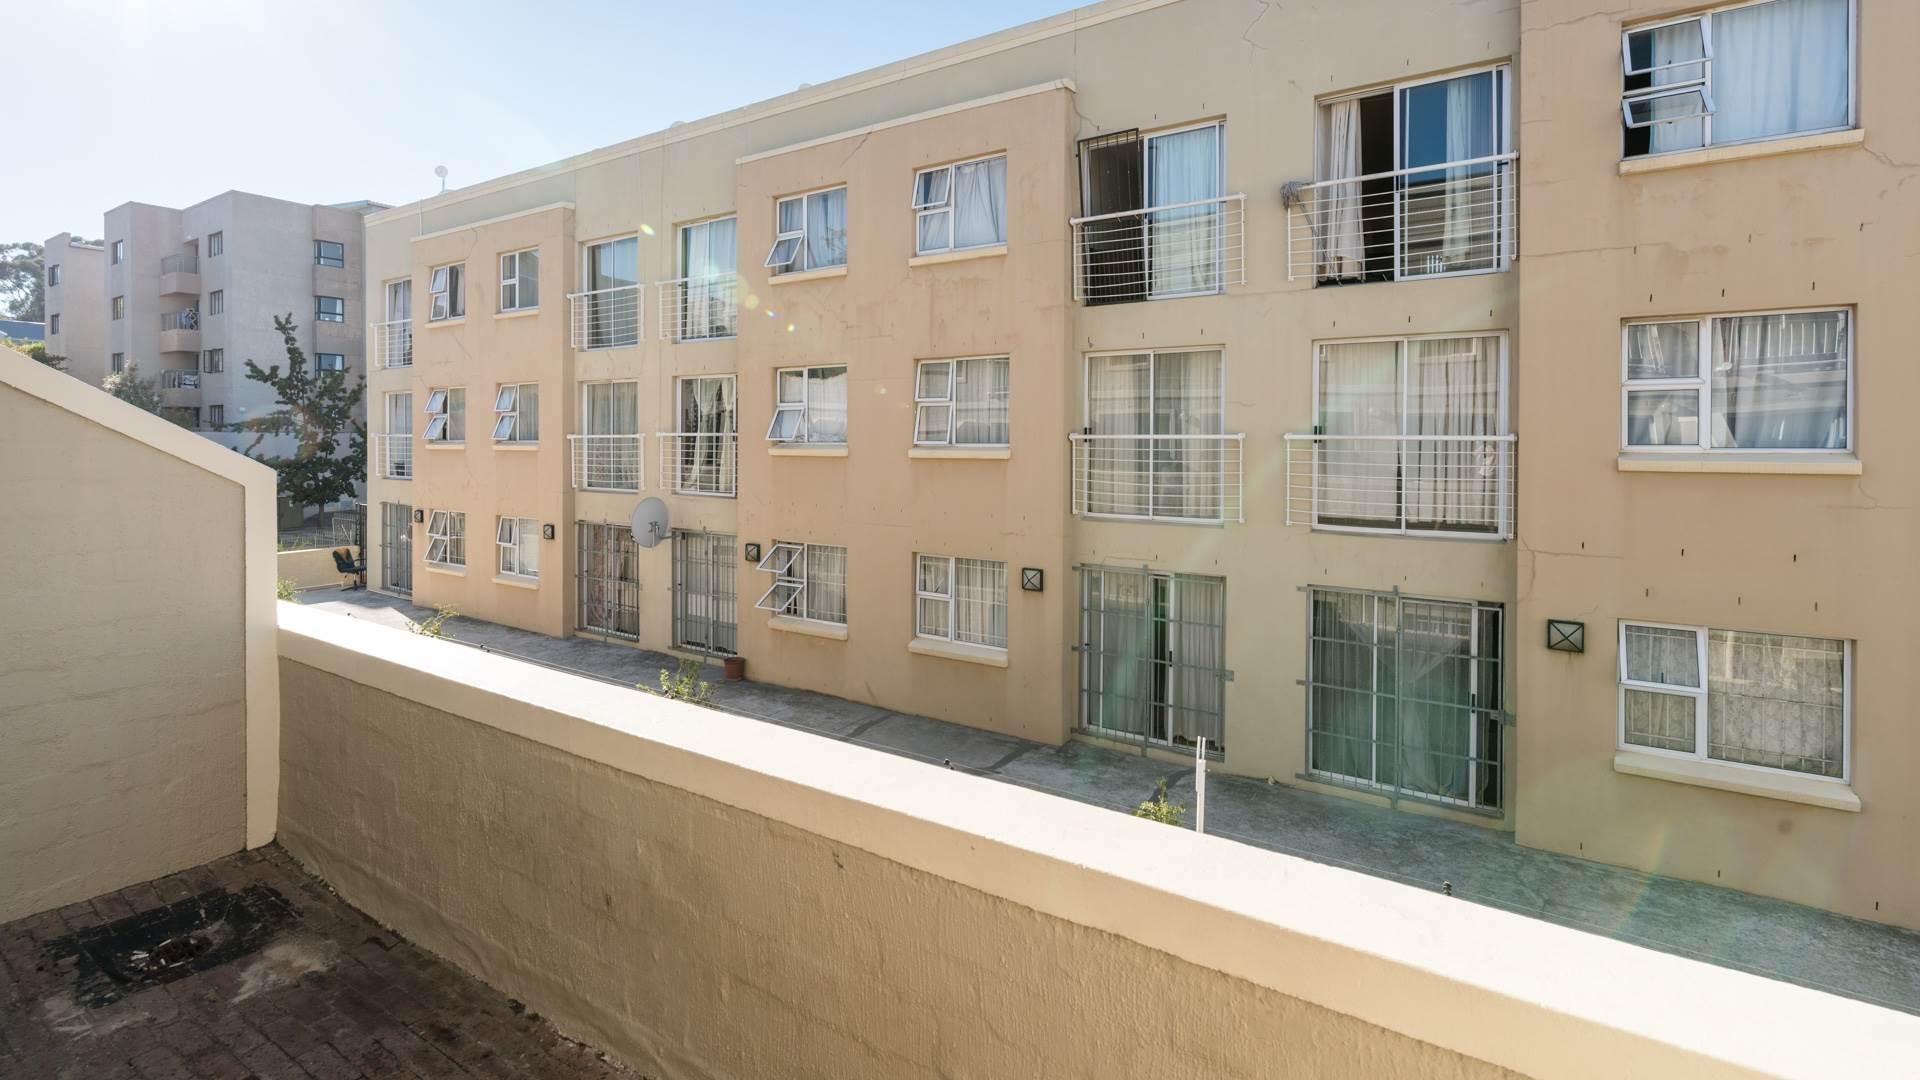 2 BedroomApartment For Sale In La Colline